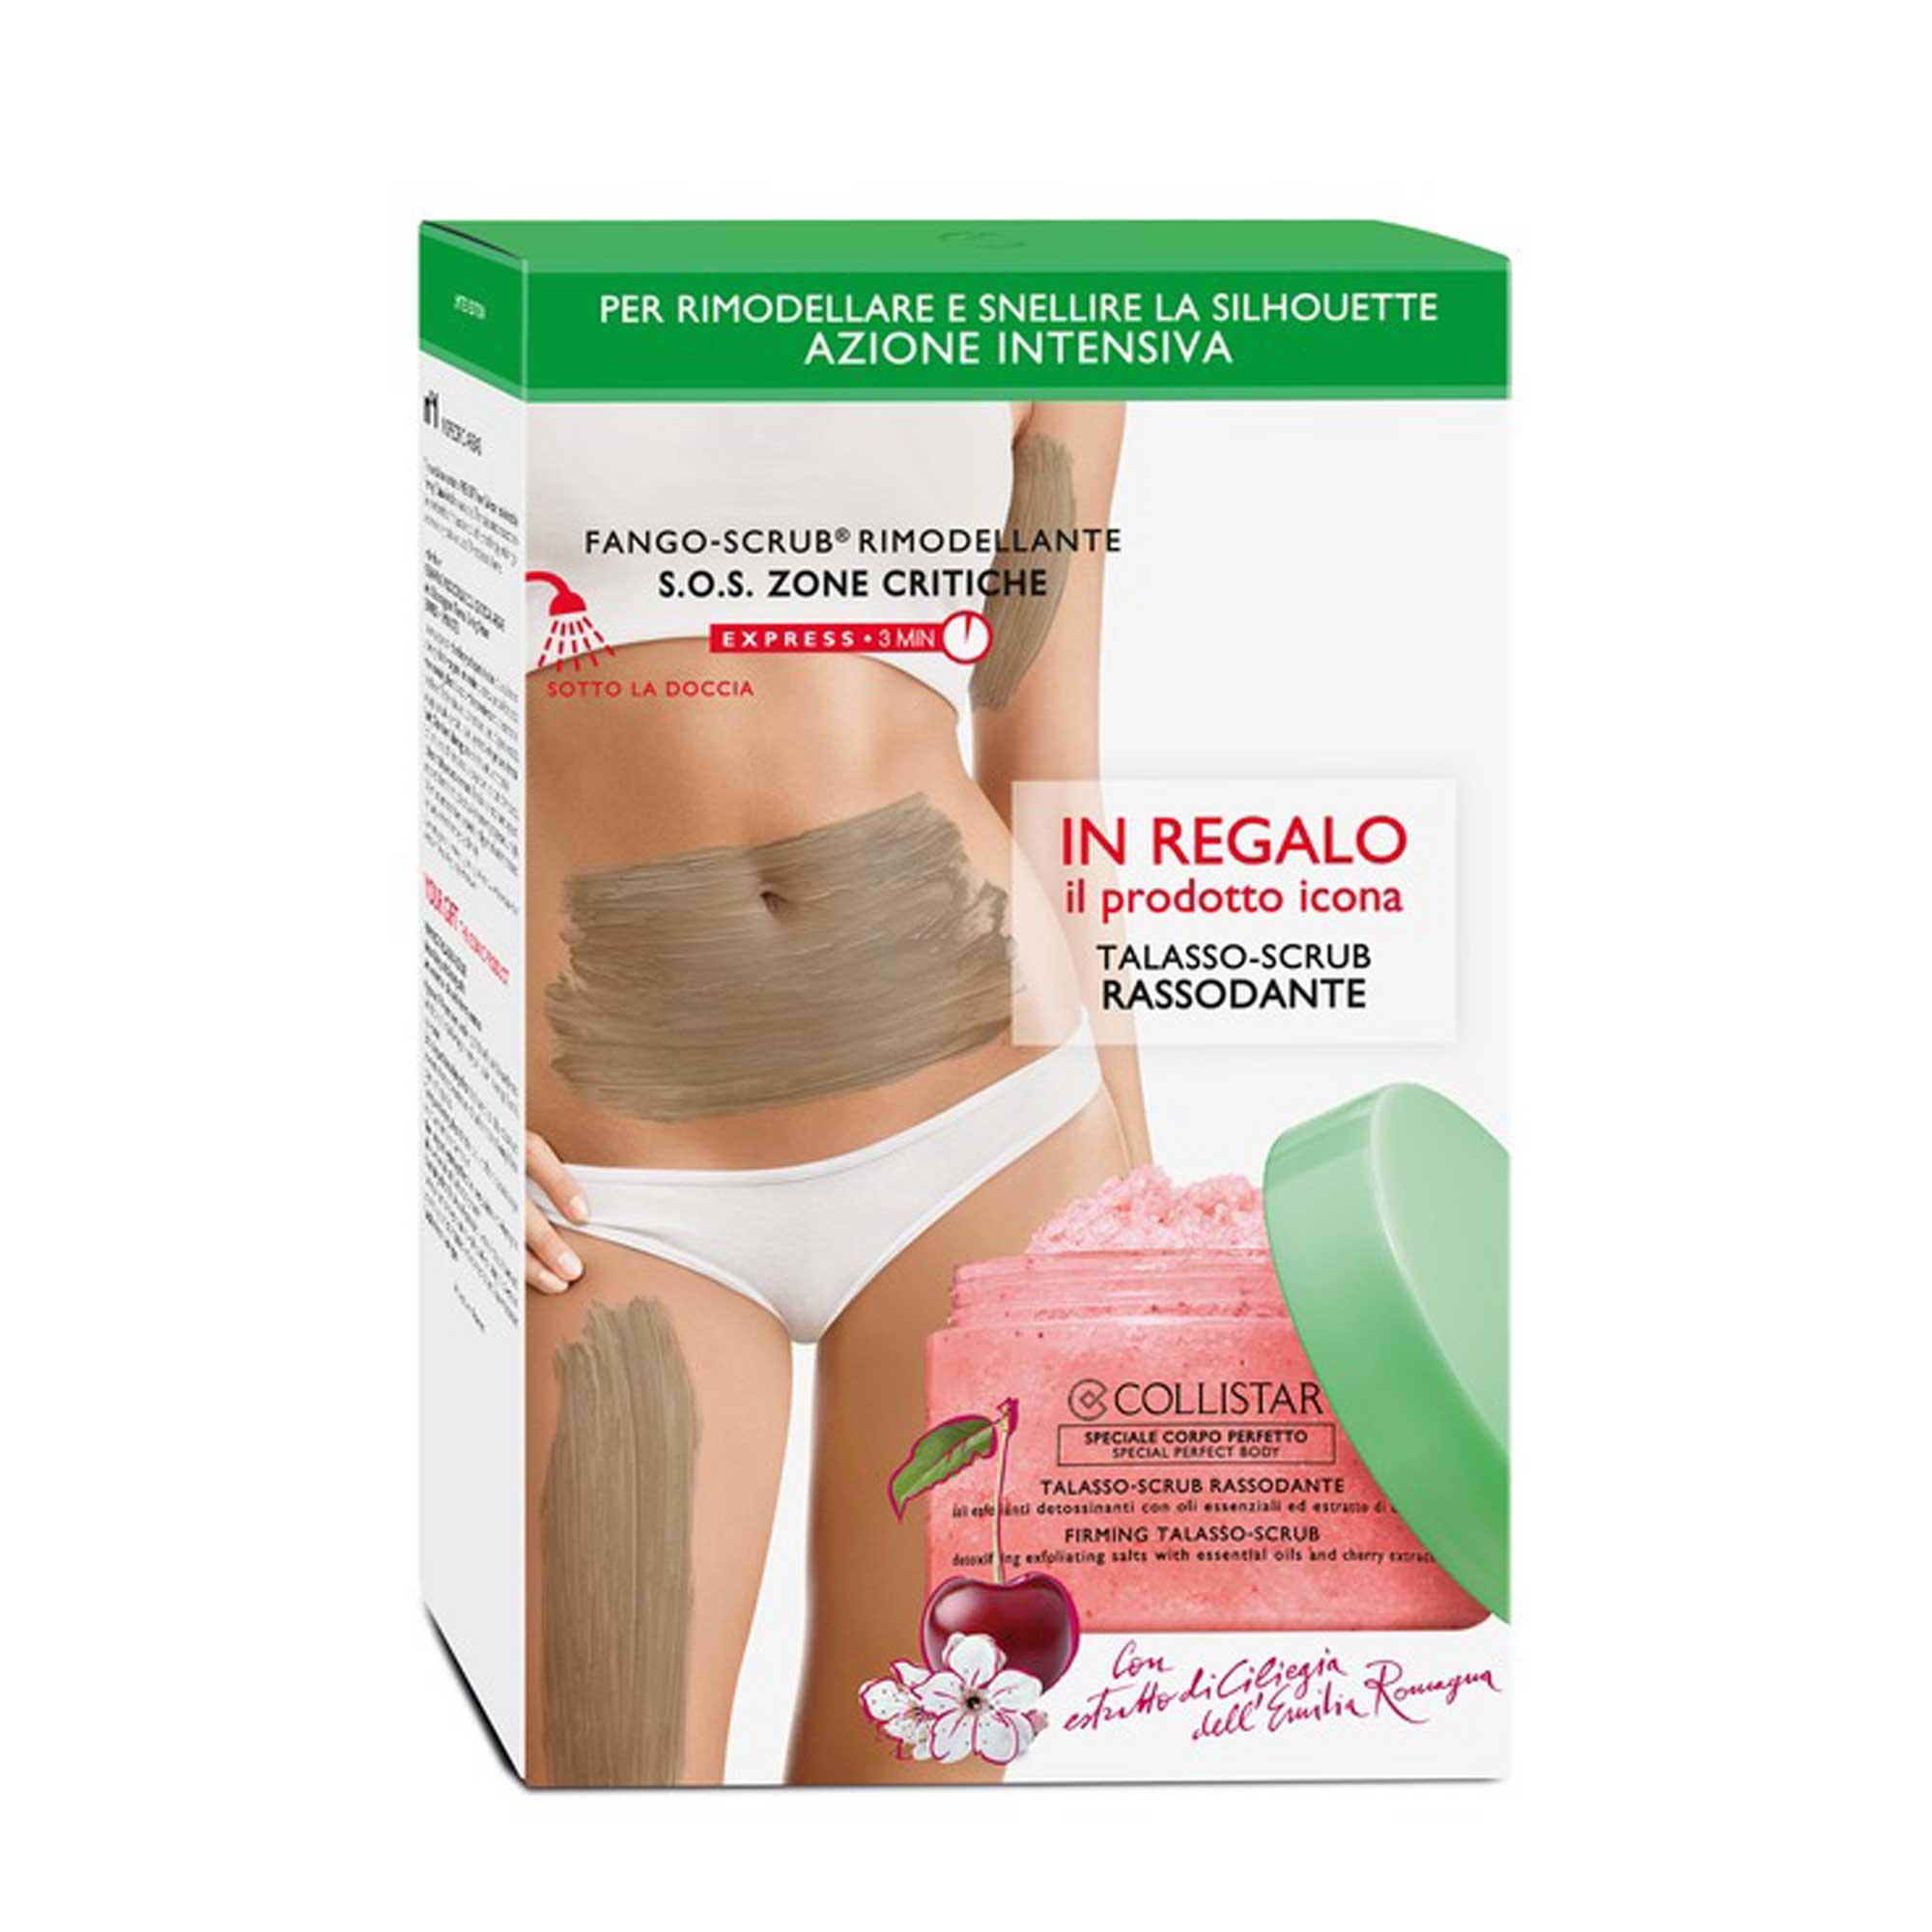 Kit Fango-Scrub® Rimodellante - Collistar